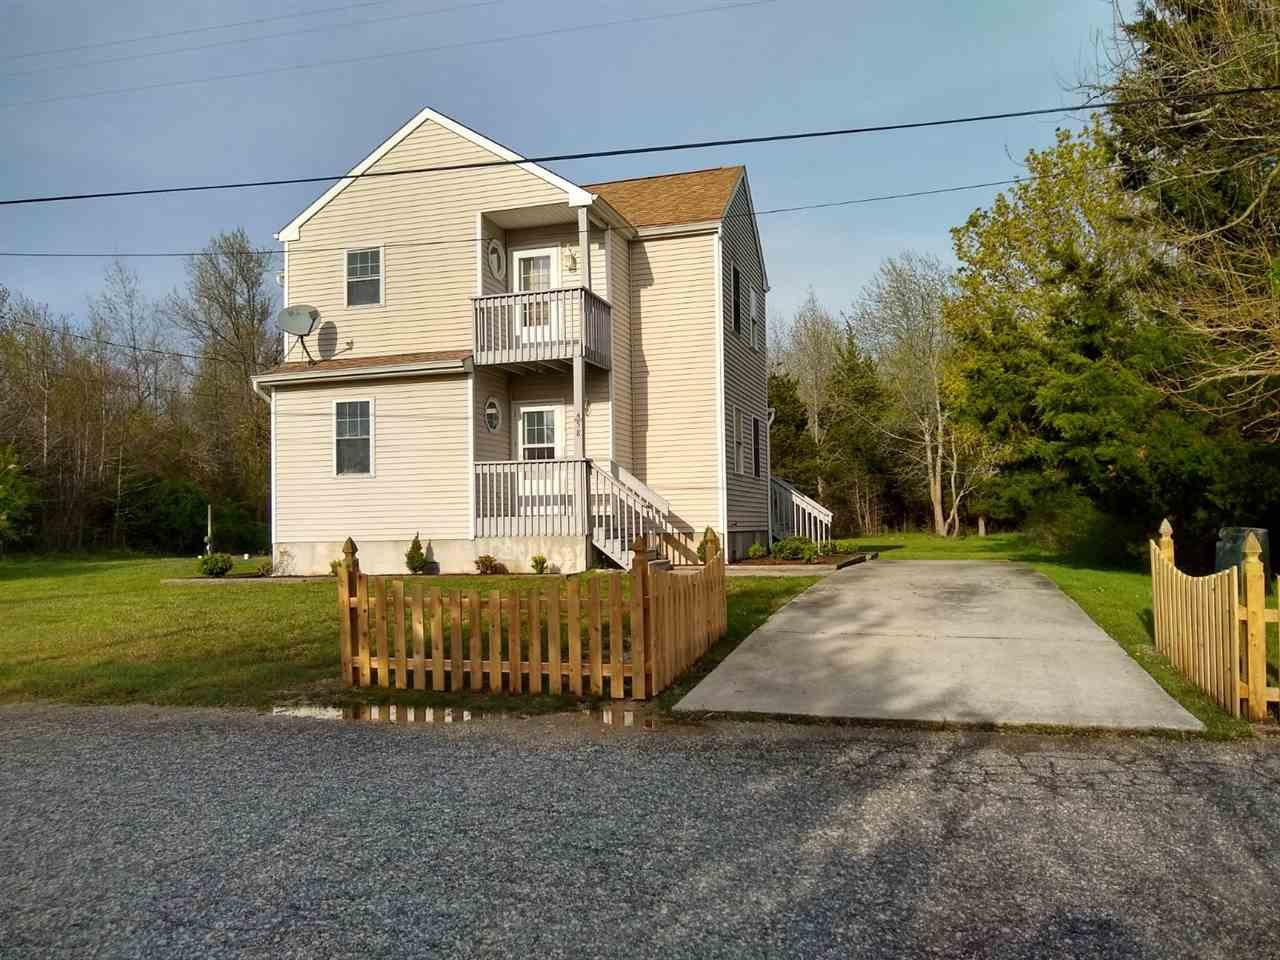 458  Stipsons Island Rd,  Eldora, NJ